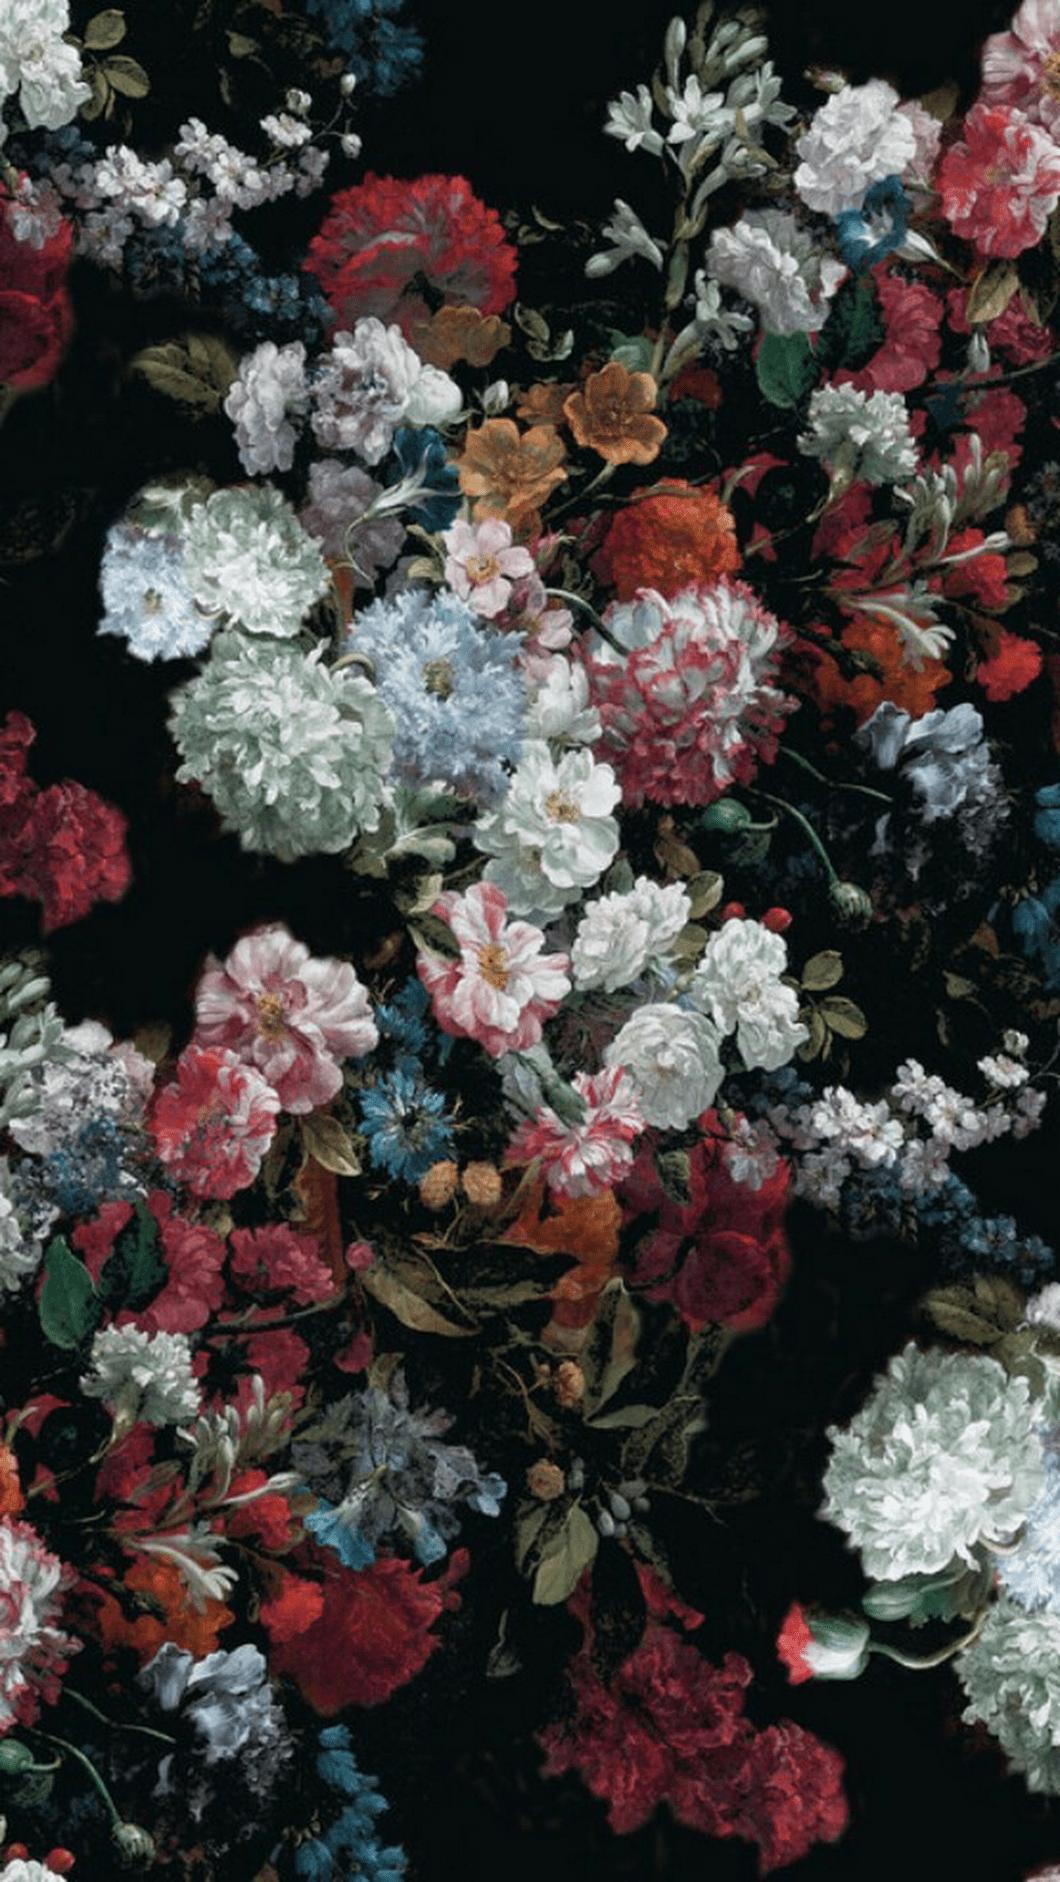 Flowers Aesthetic Wallpapers , Top Free Flowers Aesthetic